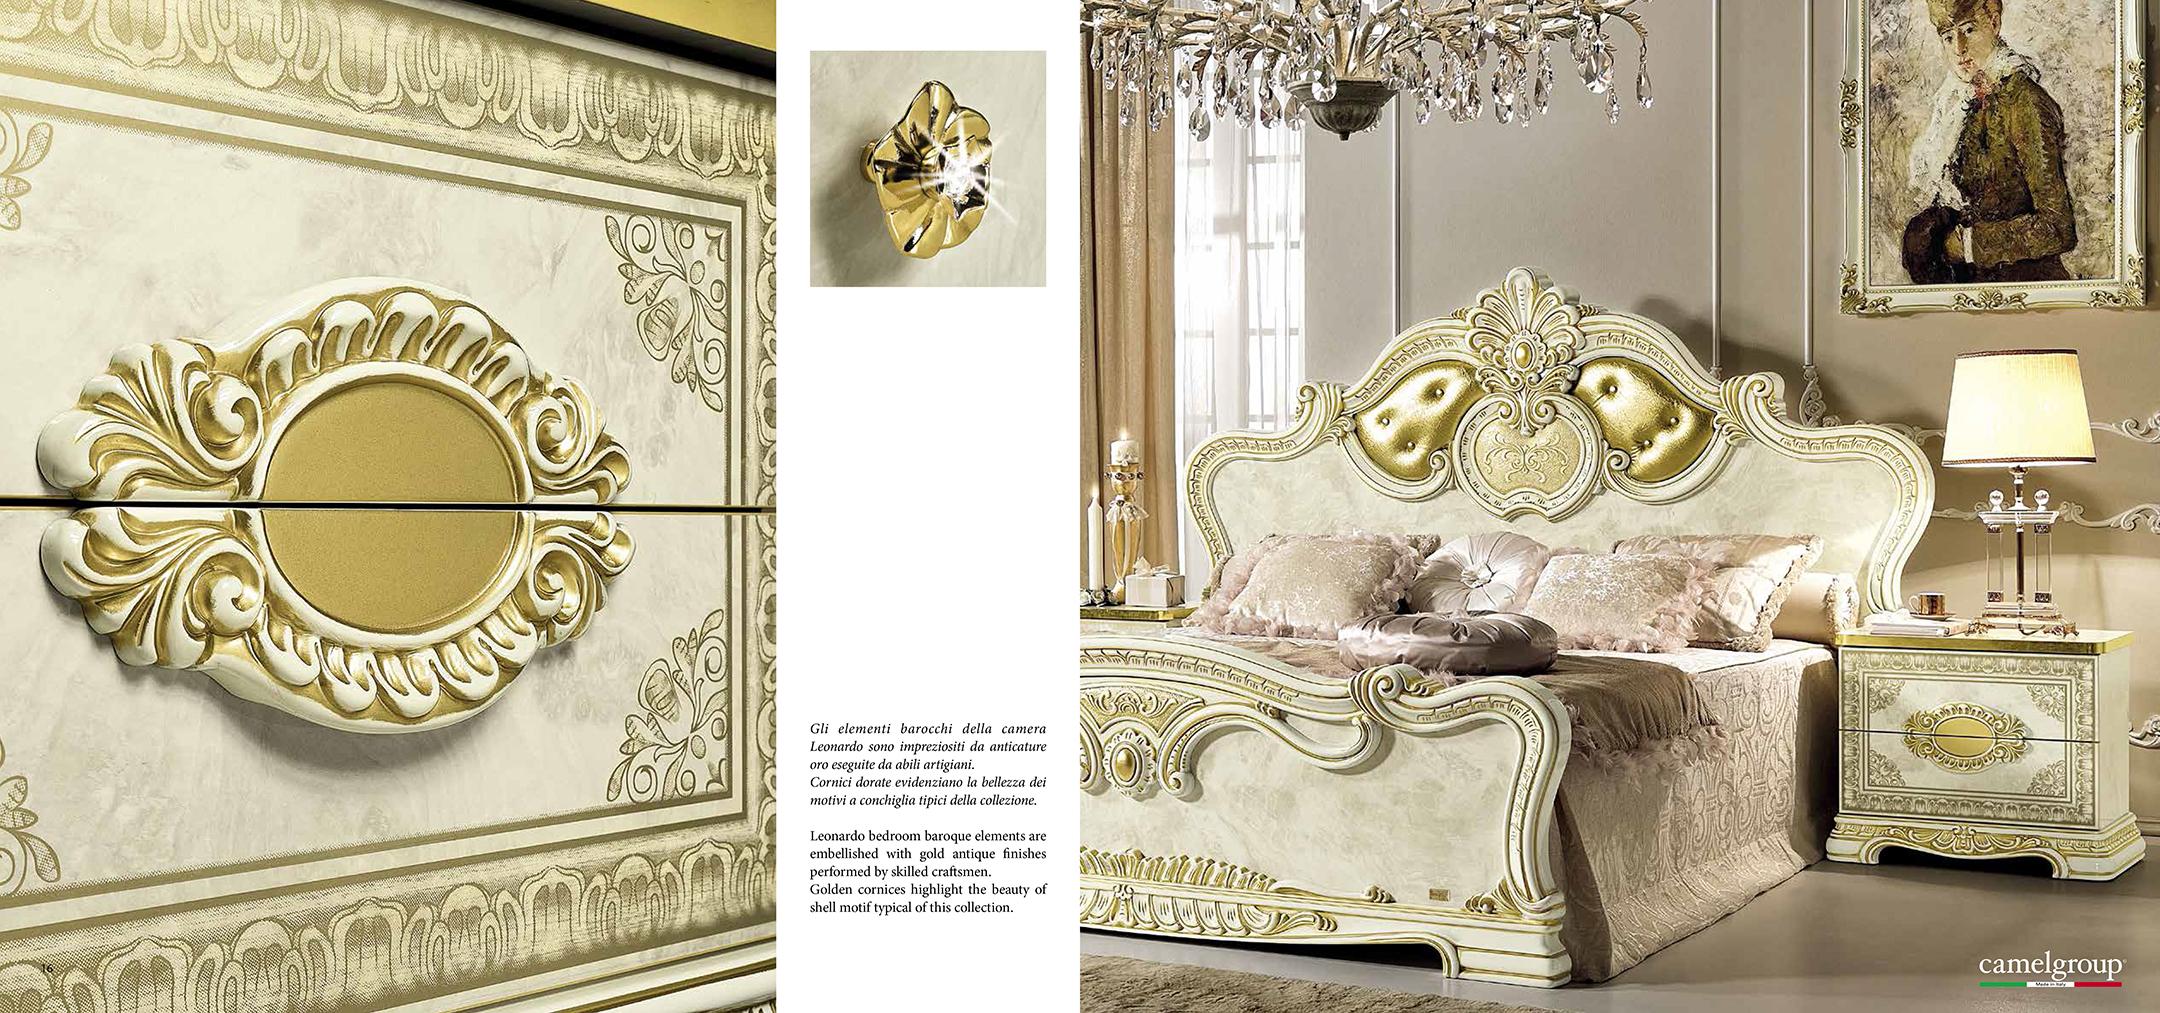 Leonardo Bedroom Camelgroup Italy Furniture Classic